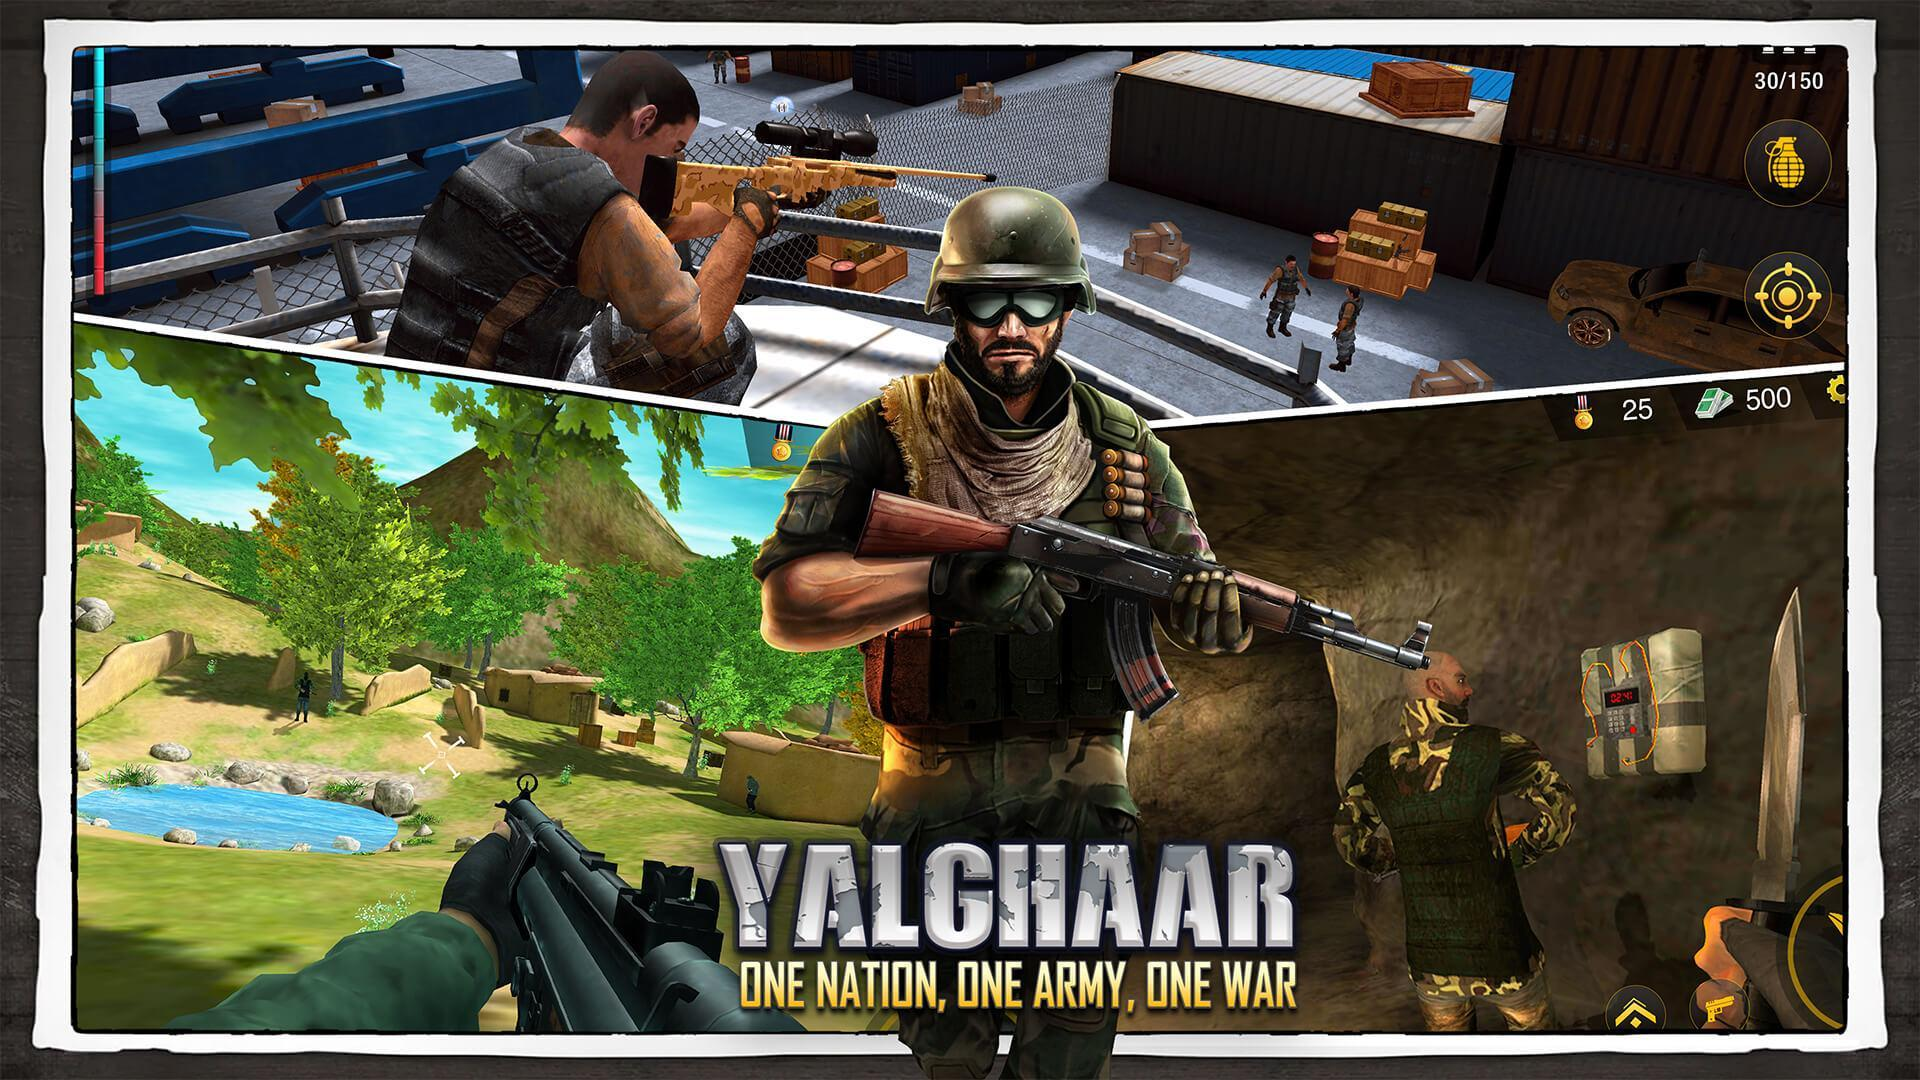 Yalghaar Delta IGI Commando Adventure Mobile Game 3.4 Screenshot 15